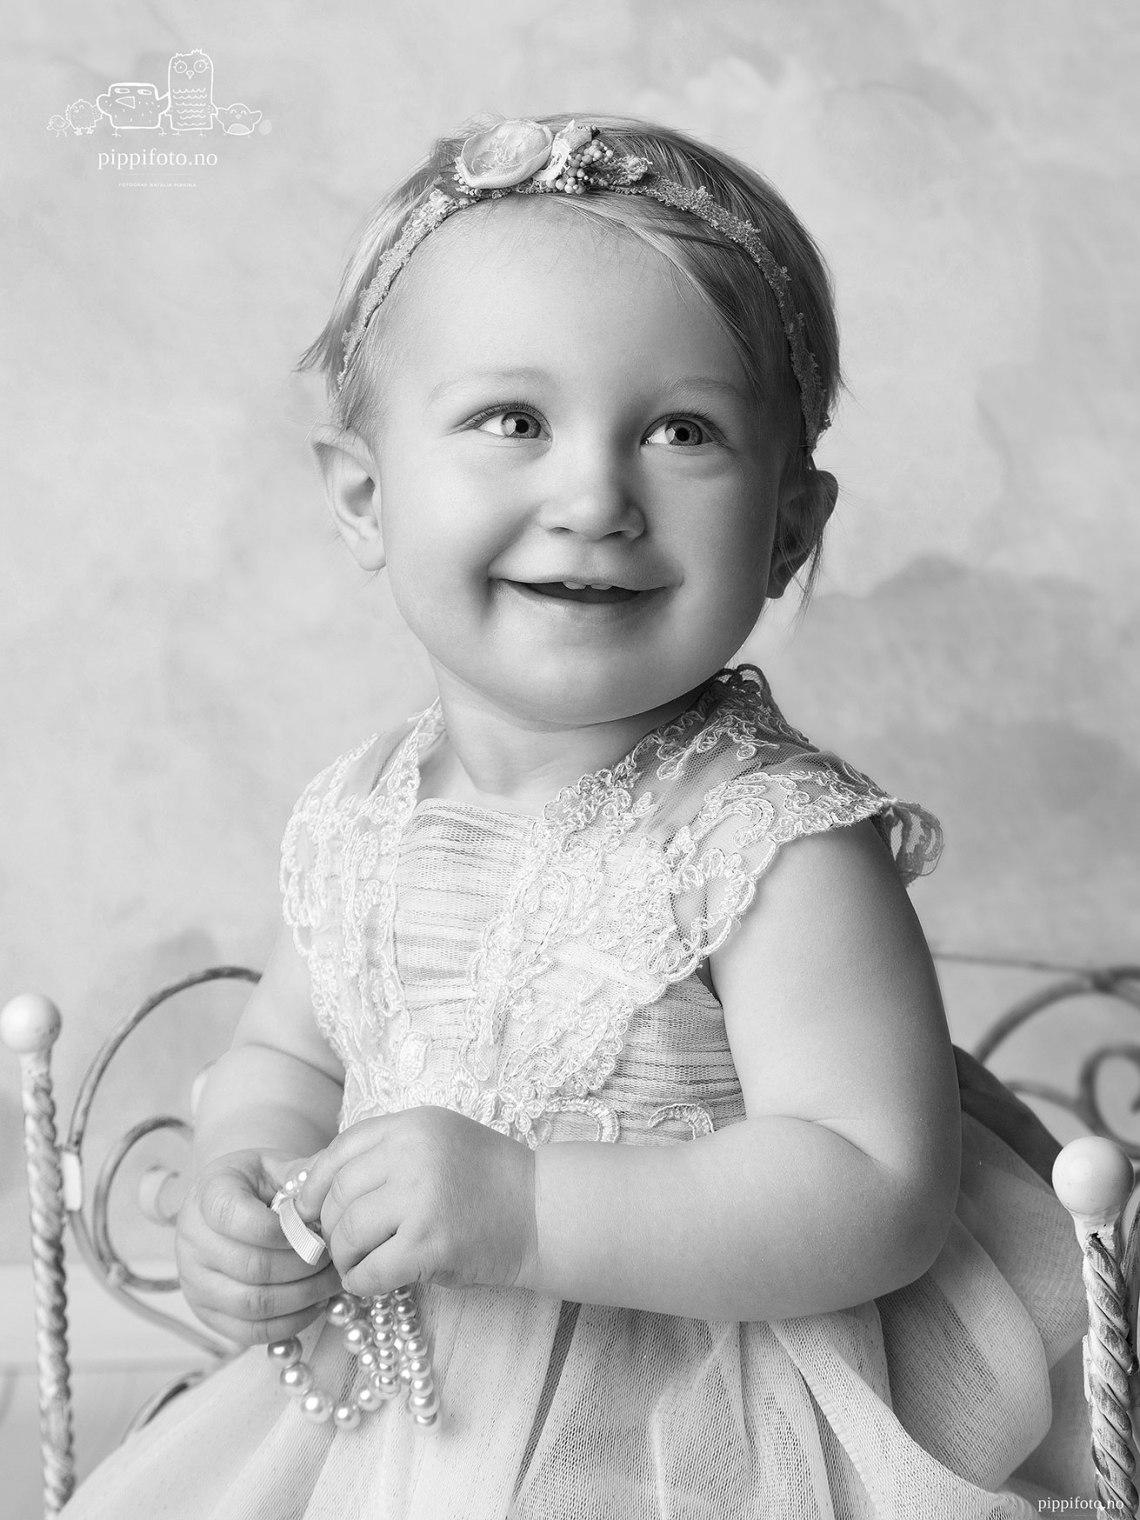 barnefotograf-Oppegård-babyfotografering-familiefotografering-studiofotografering-barneportrett